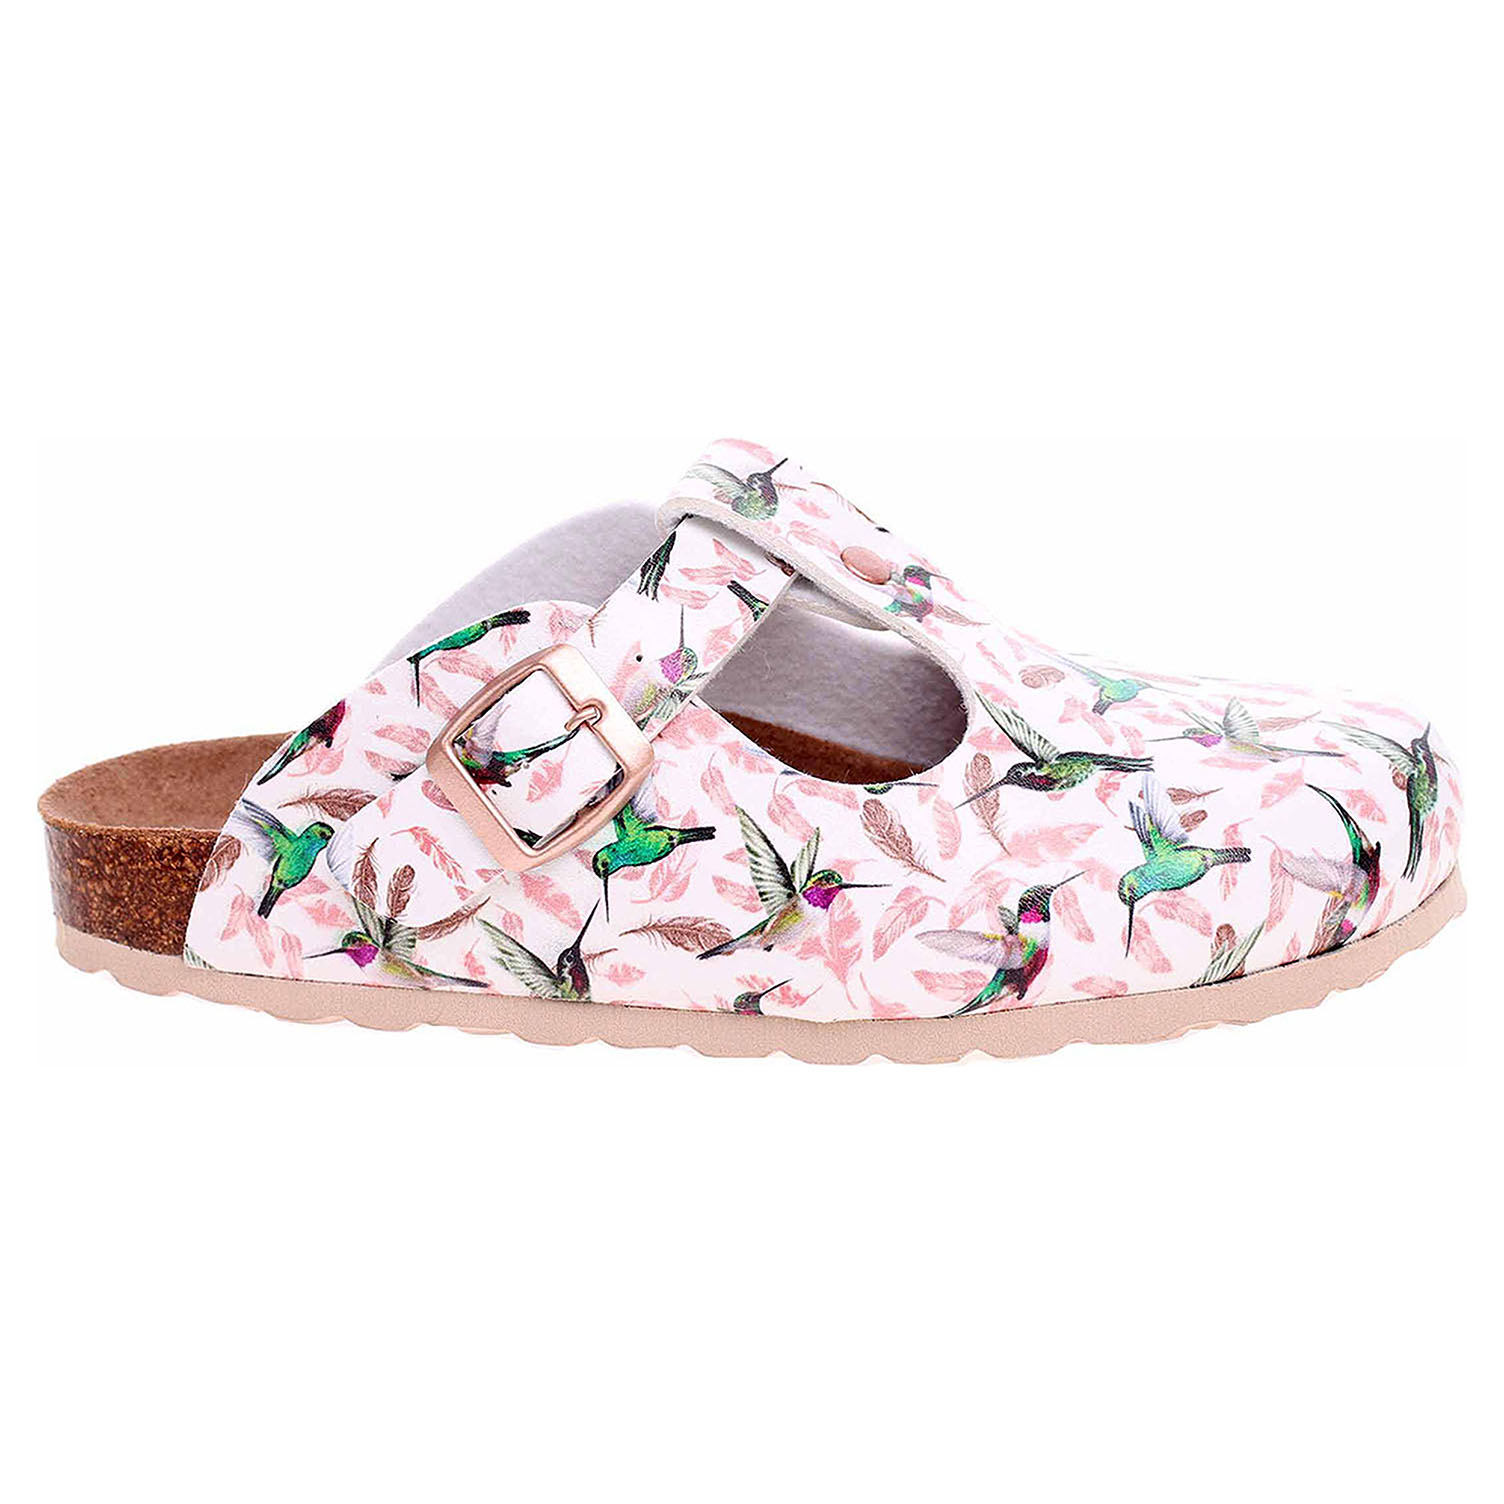 Dámské pantofle Forcare 103010 bílá-multi 103010 bílá/multi 39